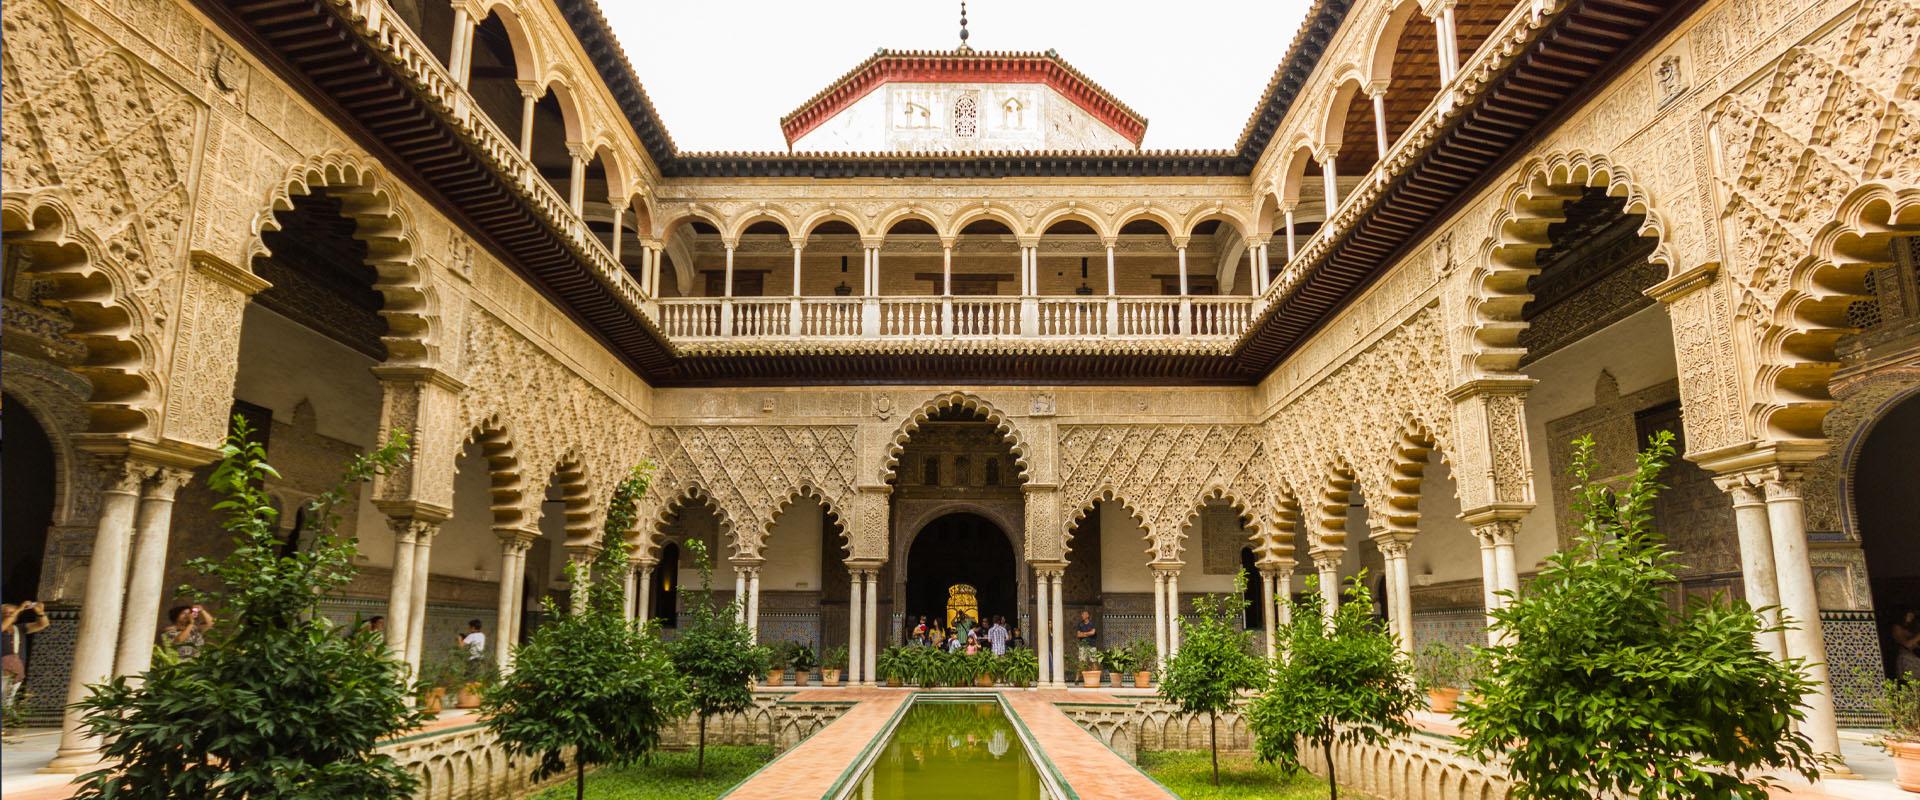 Córdoba, la perla del Al-Andalus